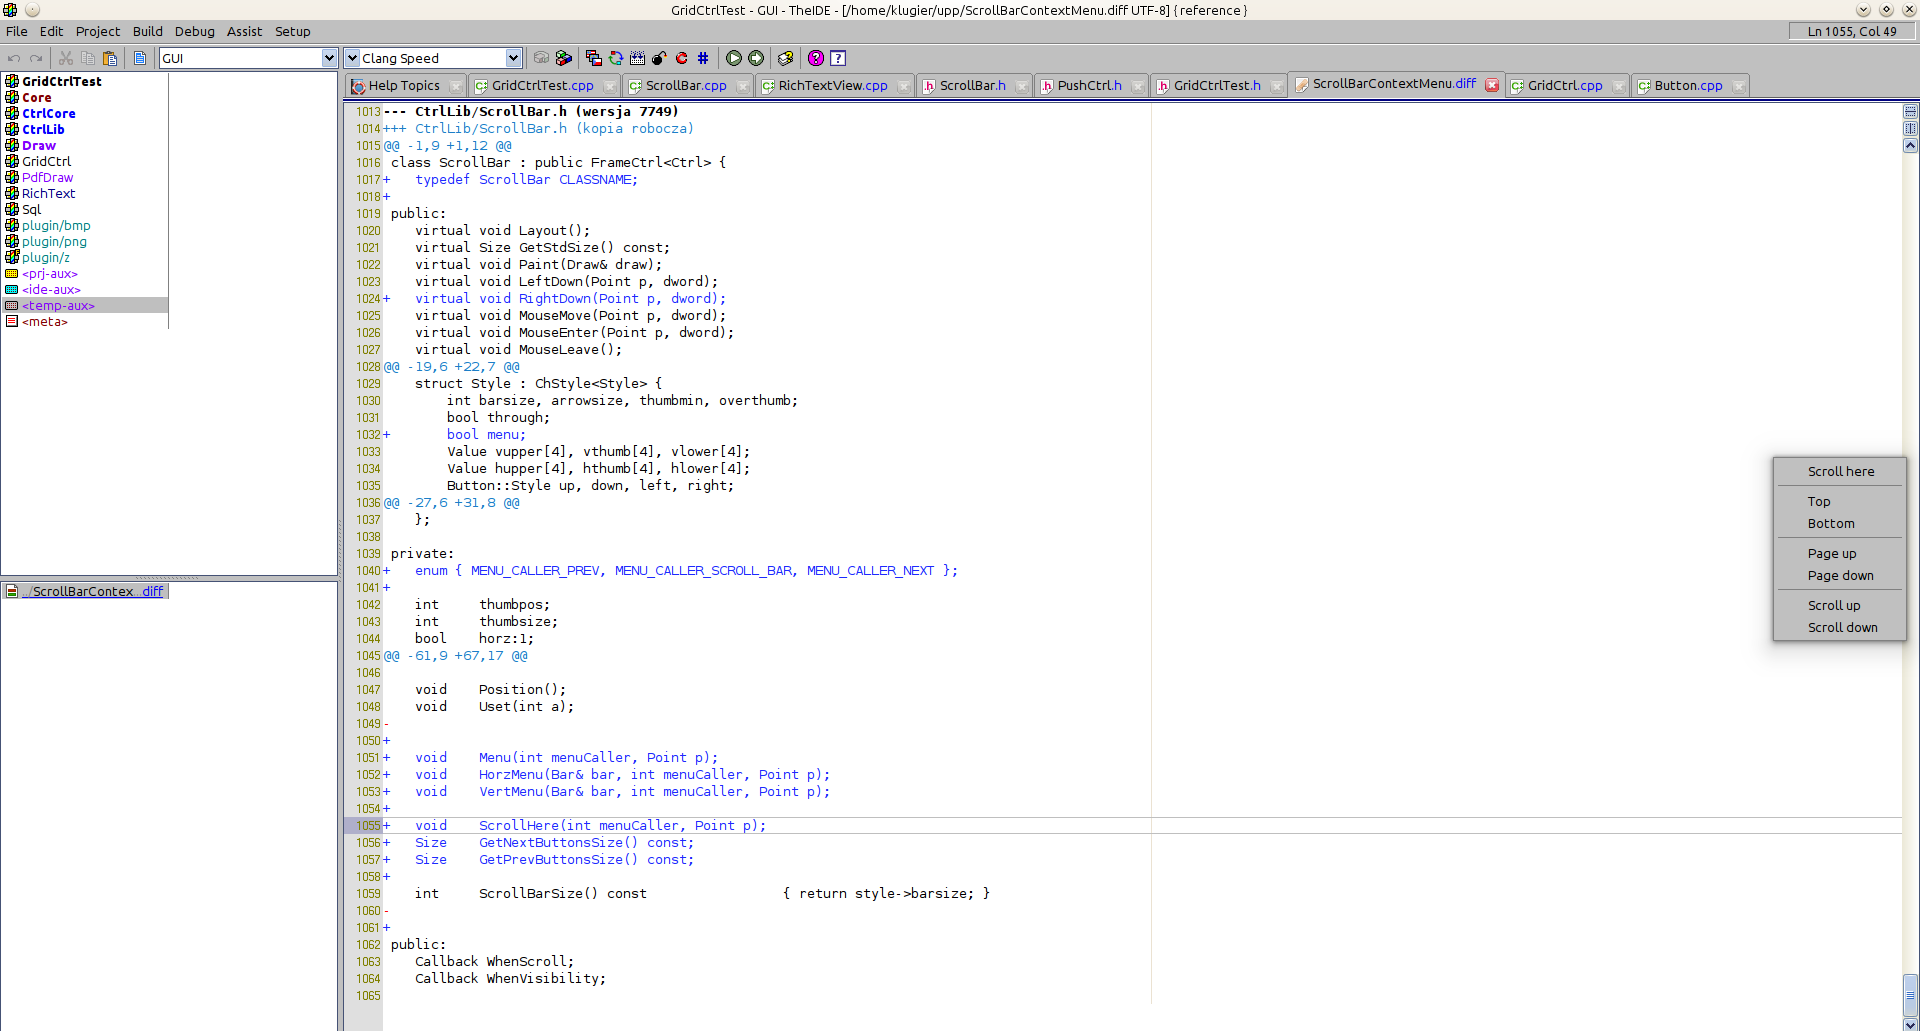 Feature #879: [Scrollbar] Scrollbar should have context menu - U++